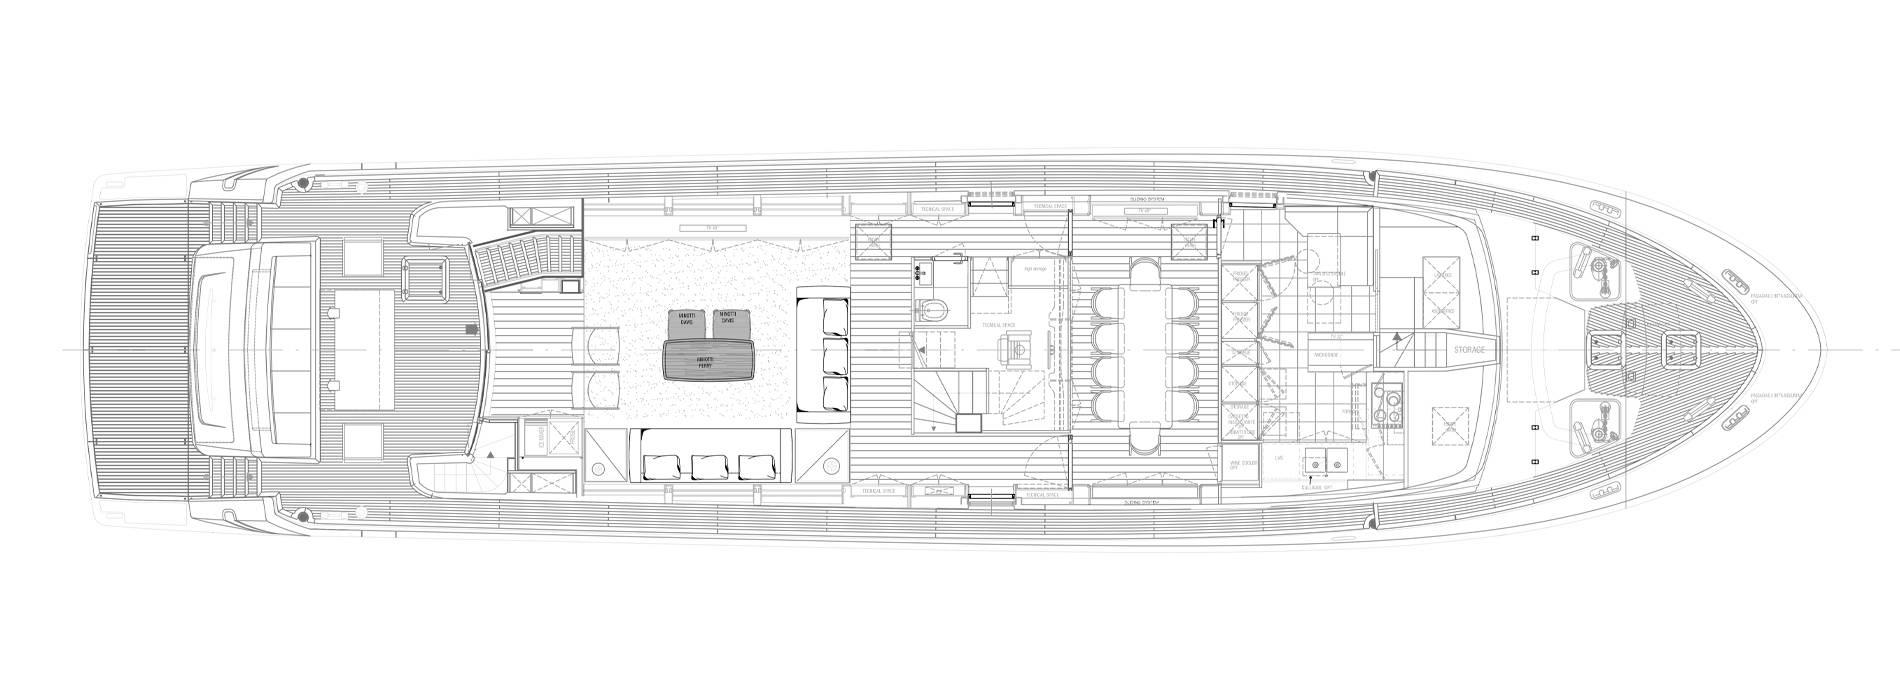 Sanlorenzo Yachts SL96-631 under offer Главная палуба